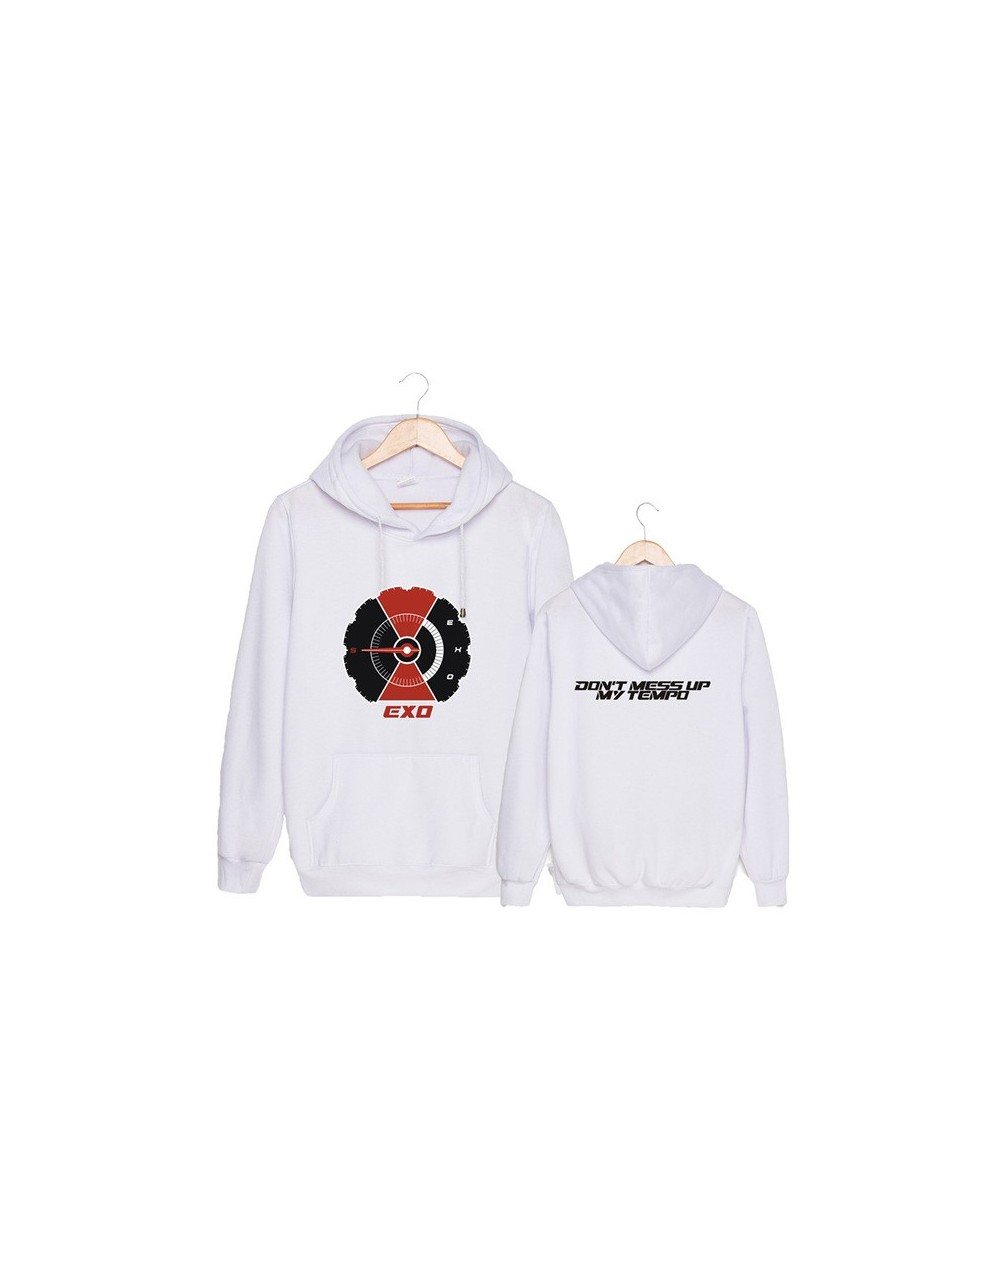 KPOP EXO 5th Album DON'T MESS UP MY TEMPO BAEKHYUN D.O. Hip Hop Hooded Sweatshirt Long Sleeve Tops K-POP Pullovers Hoodies P...